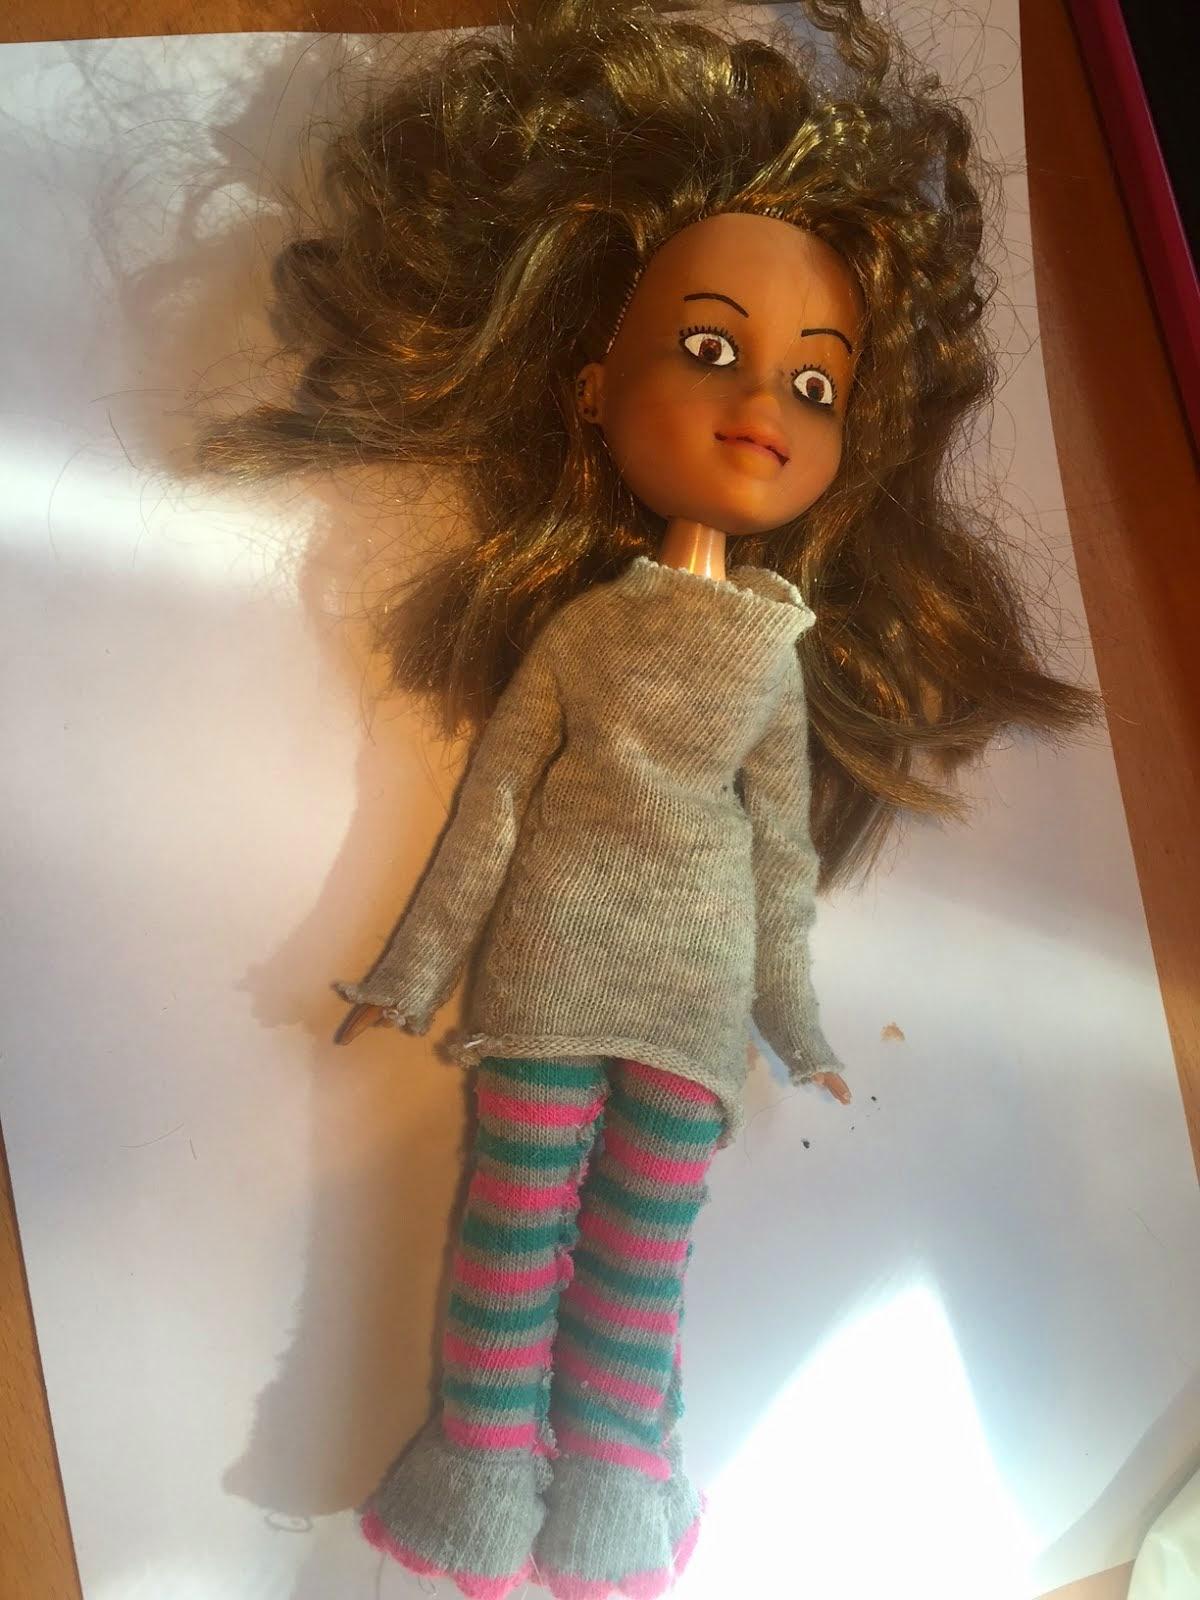 Muñeca con cara real